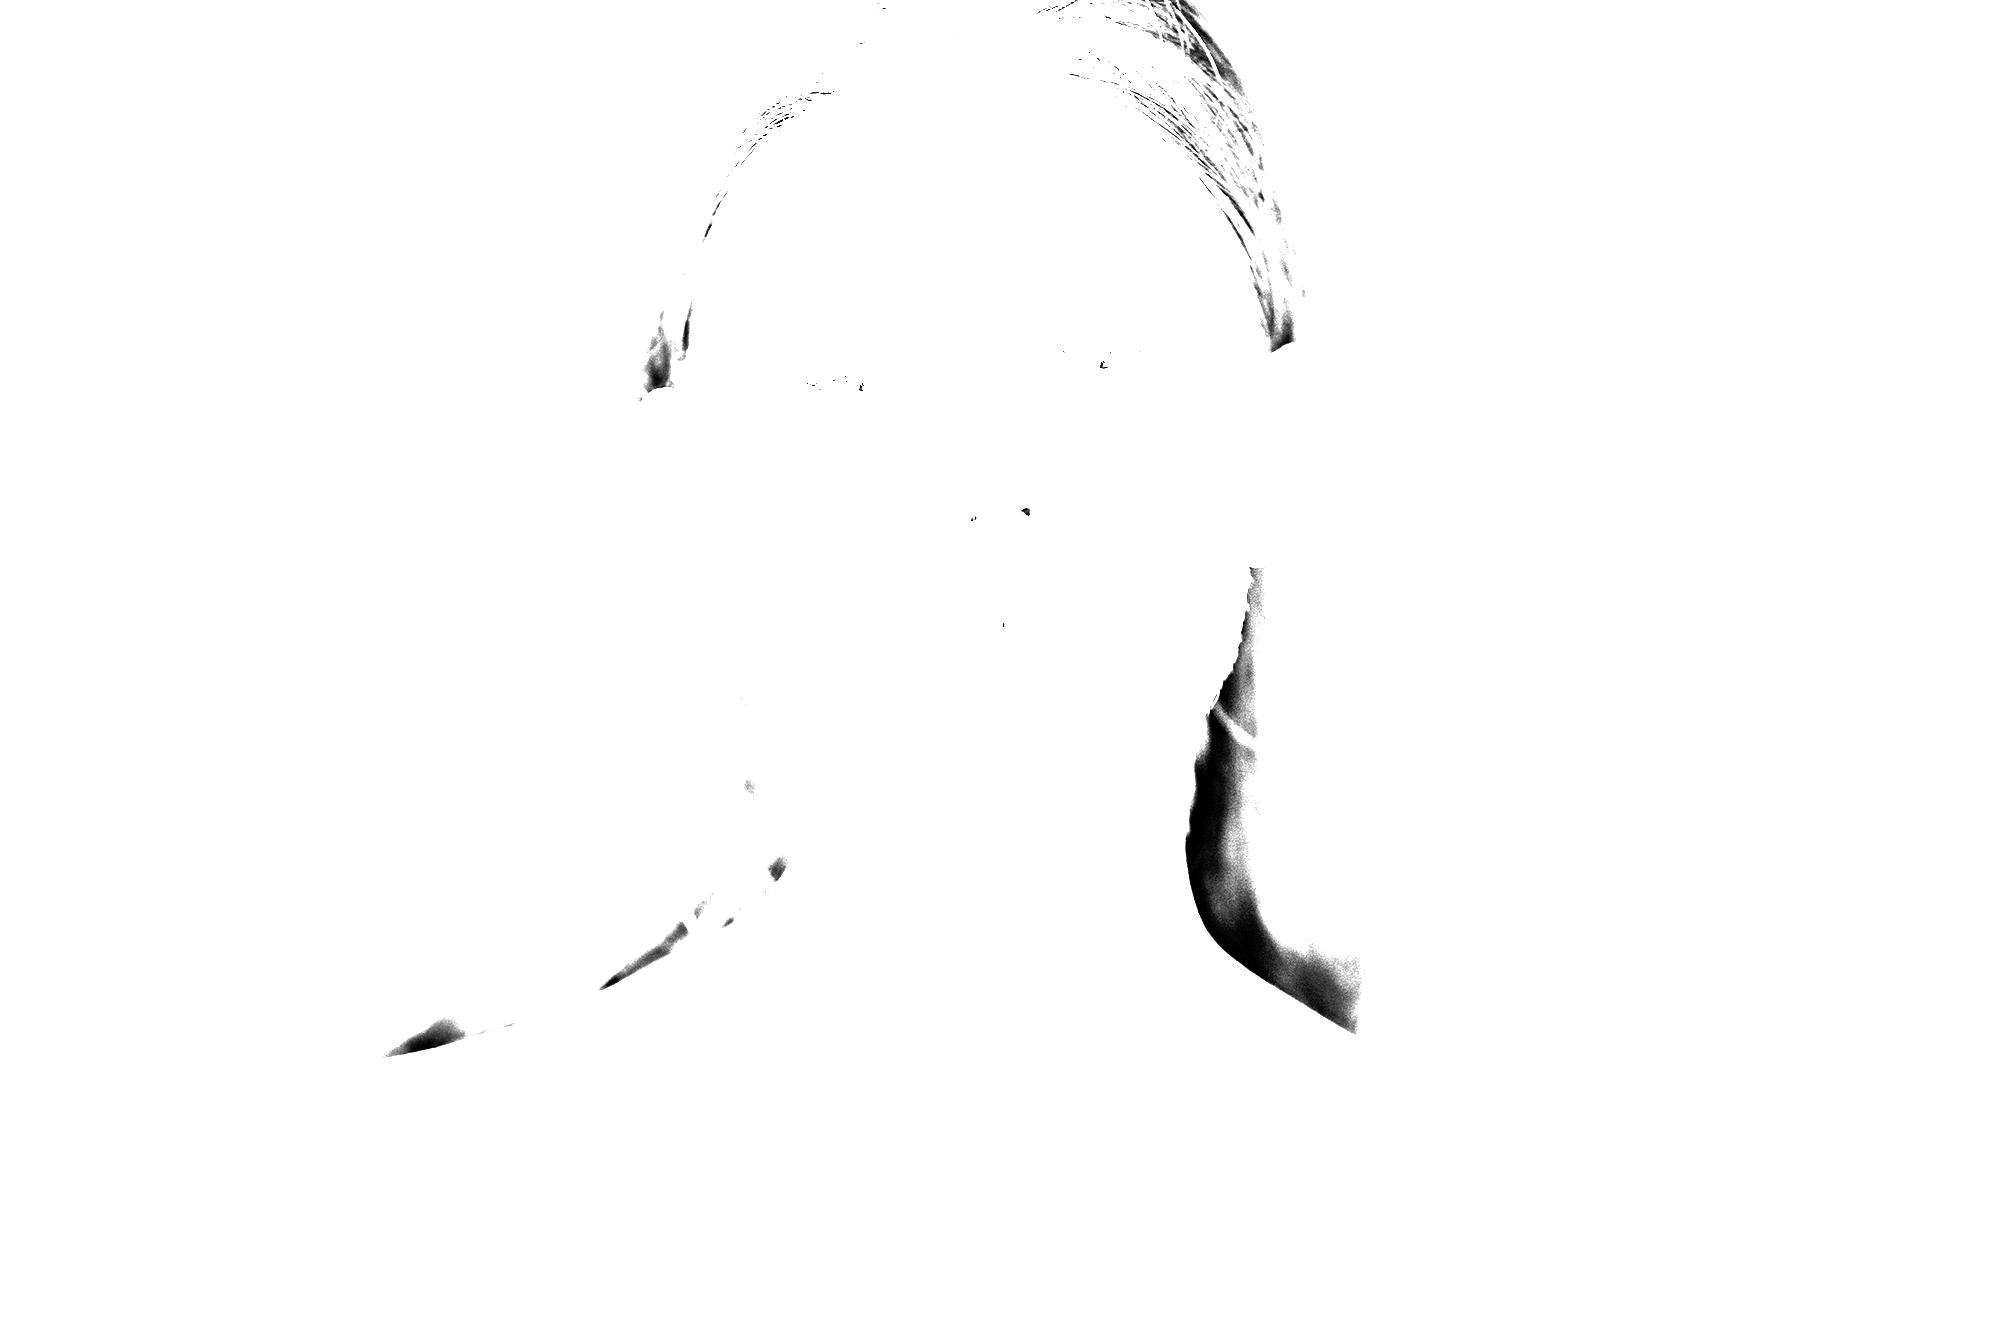 20161230-DSC_1106.png